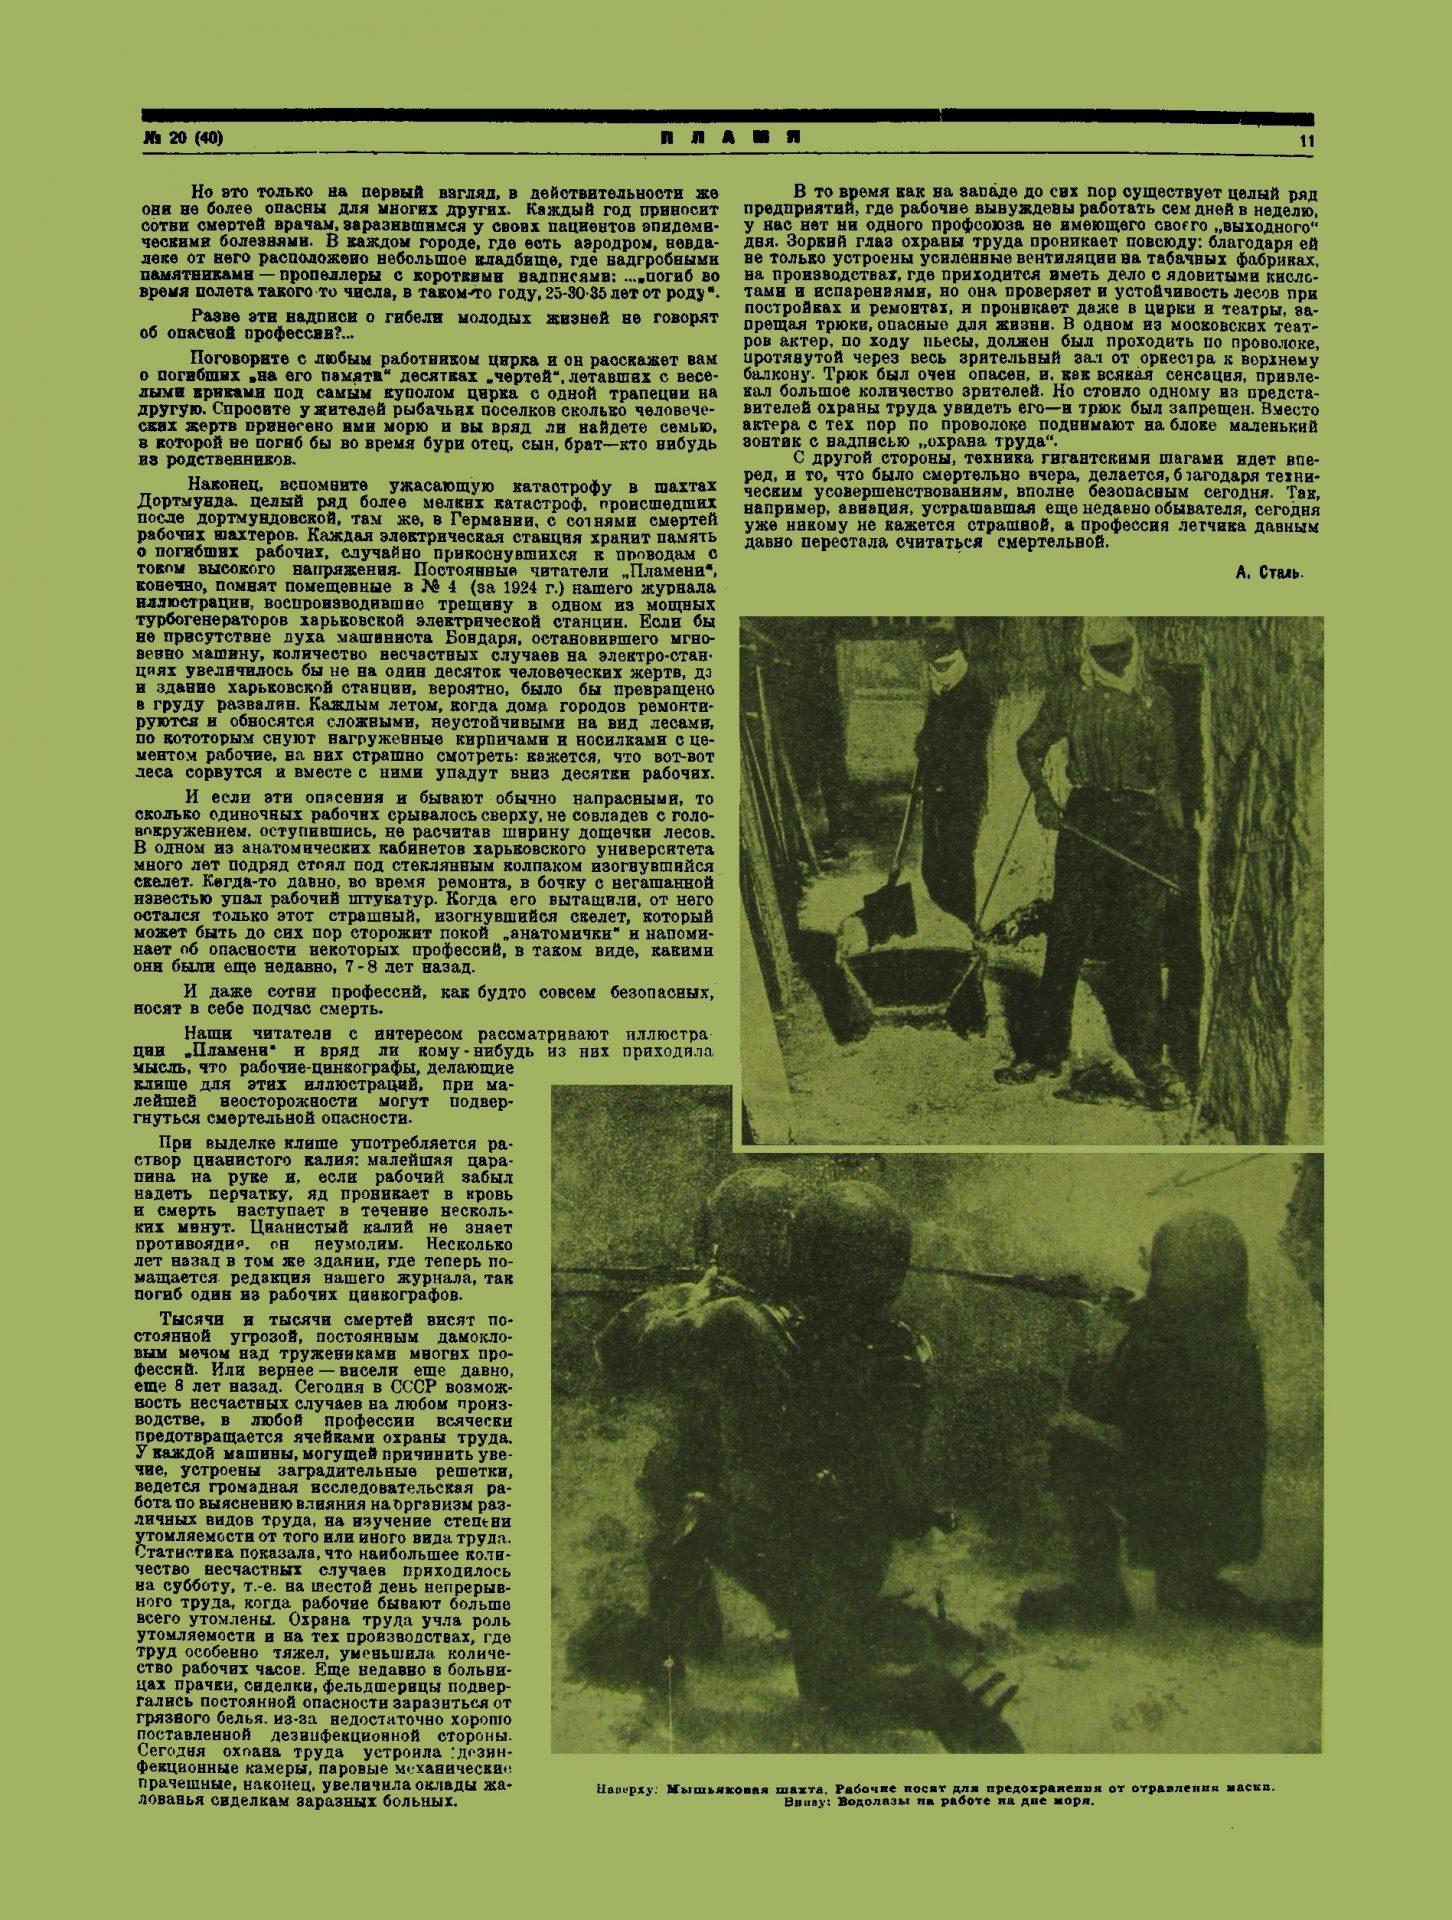 Пламя_1925_№ 20